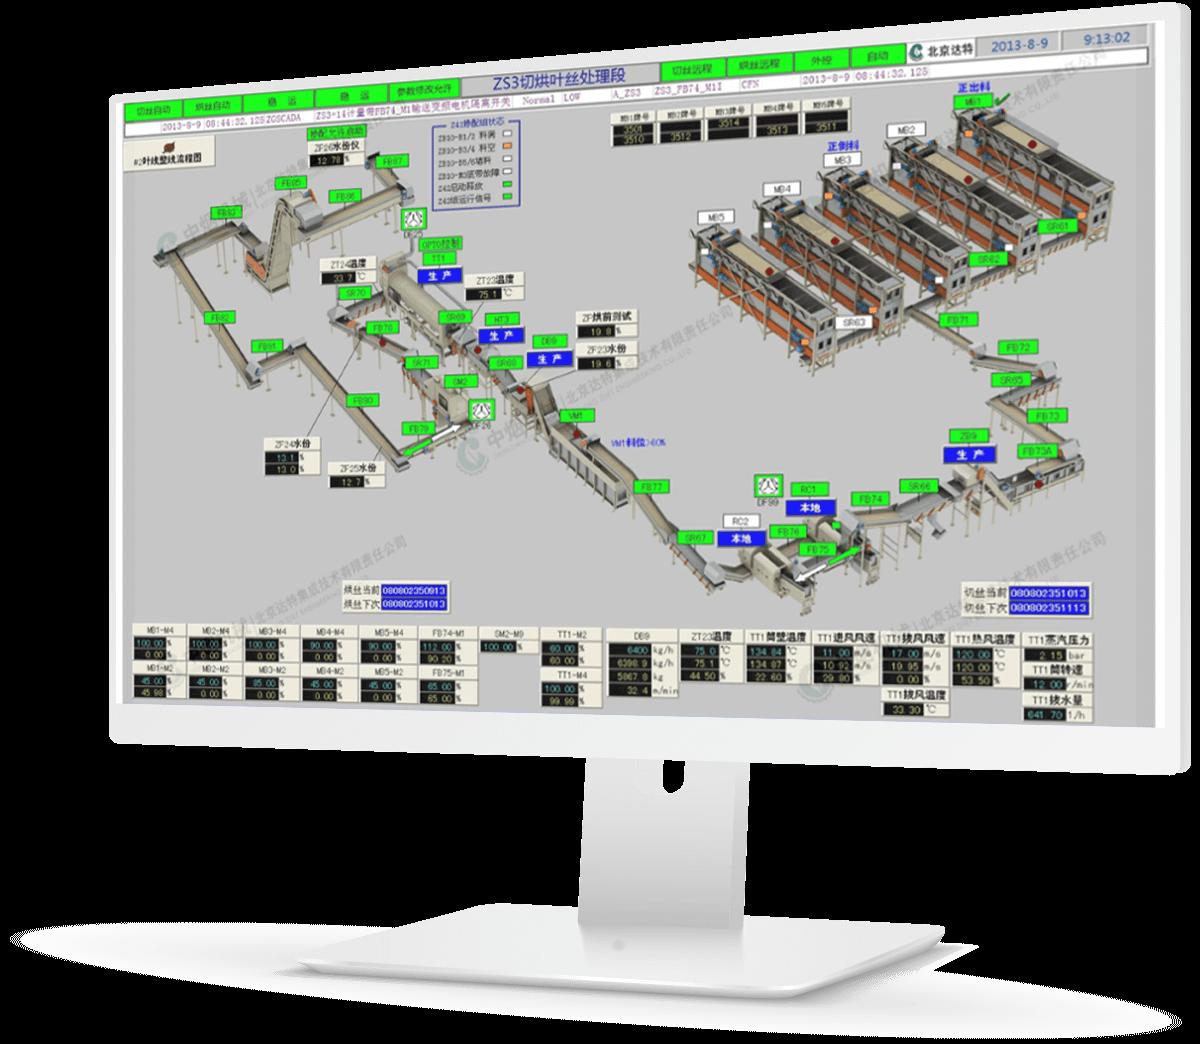 Beijing Dart uses GE Digital's iFIX HMI/SCADA in its manufacturing operations